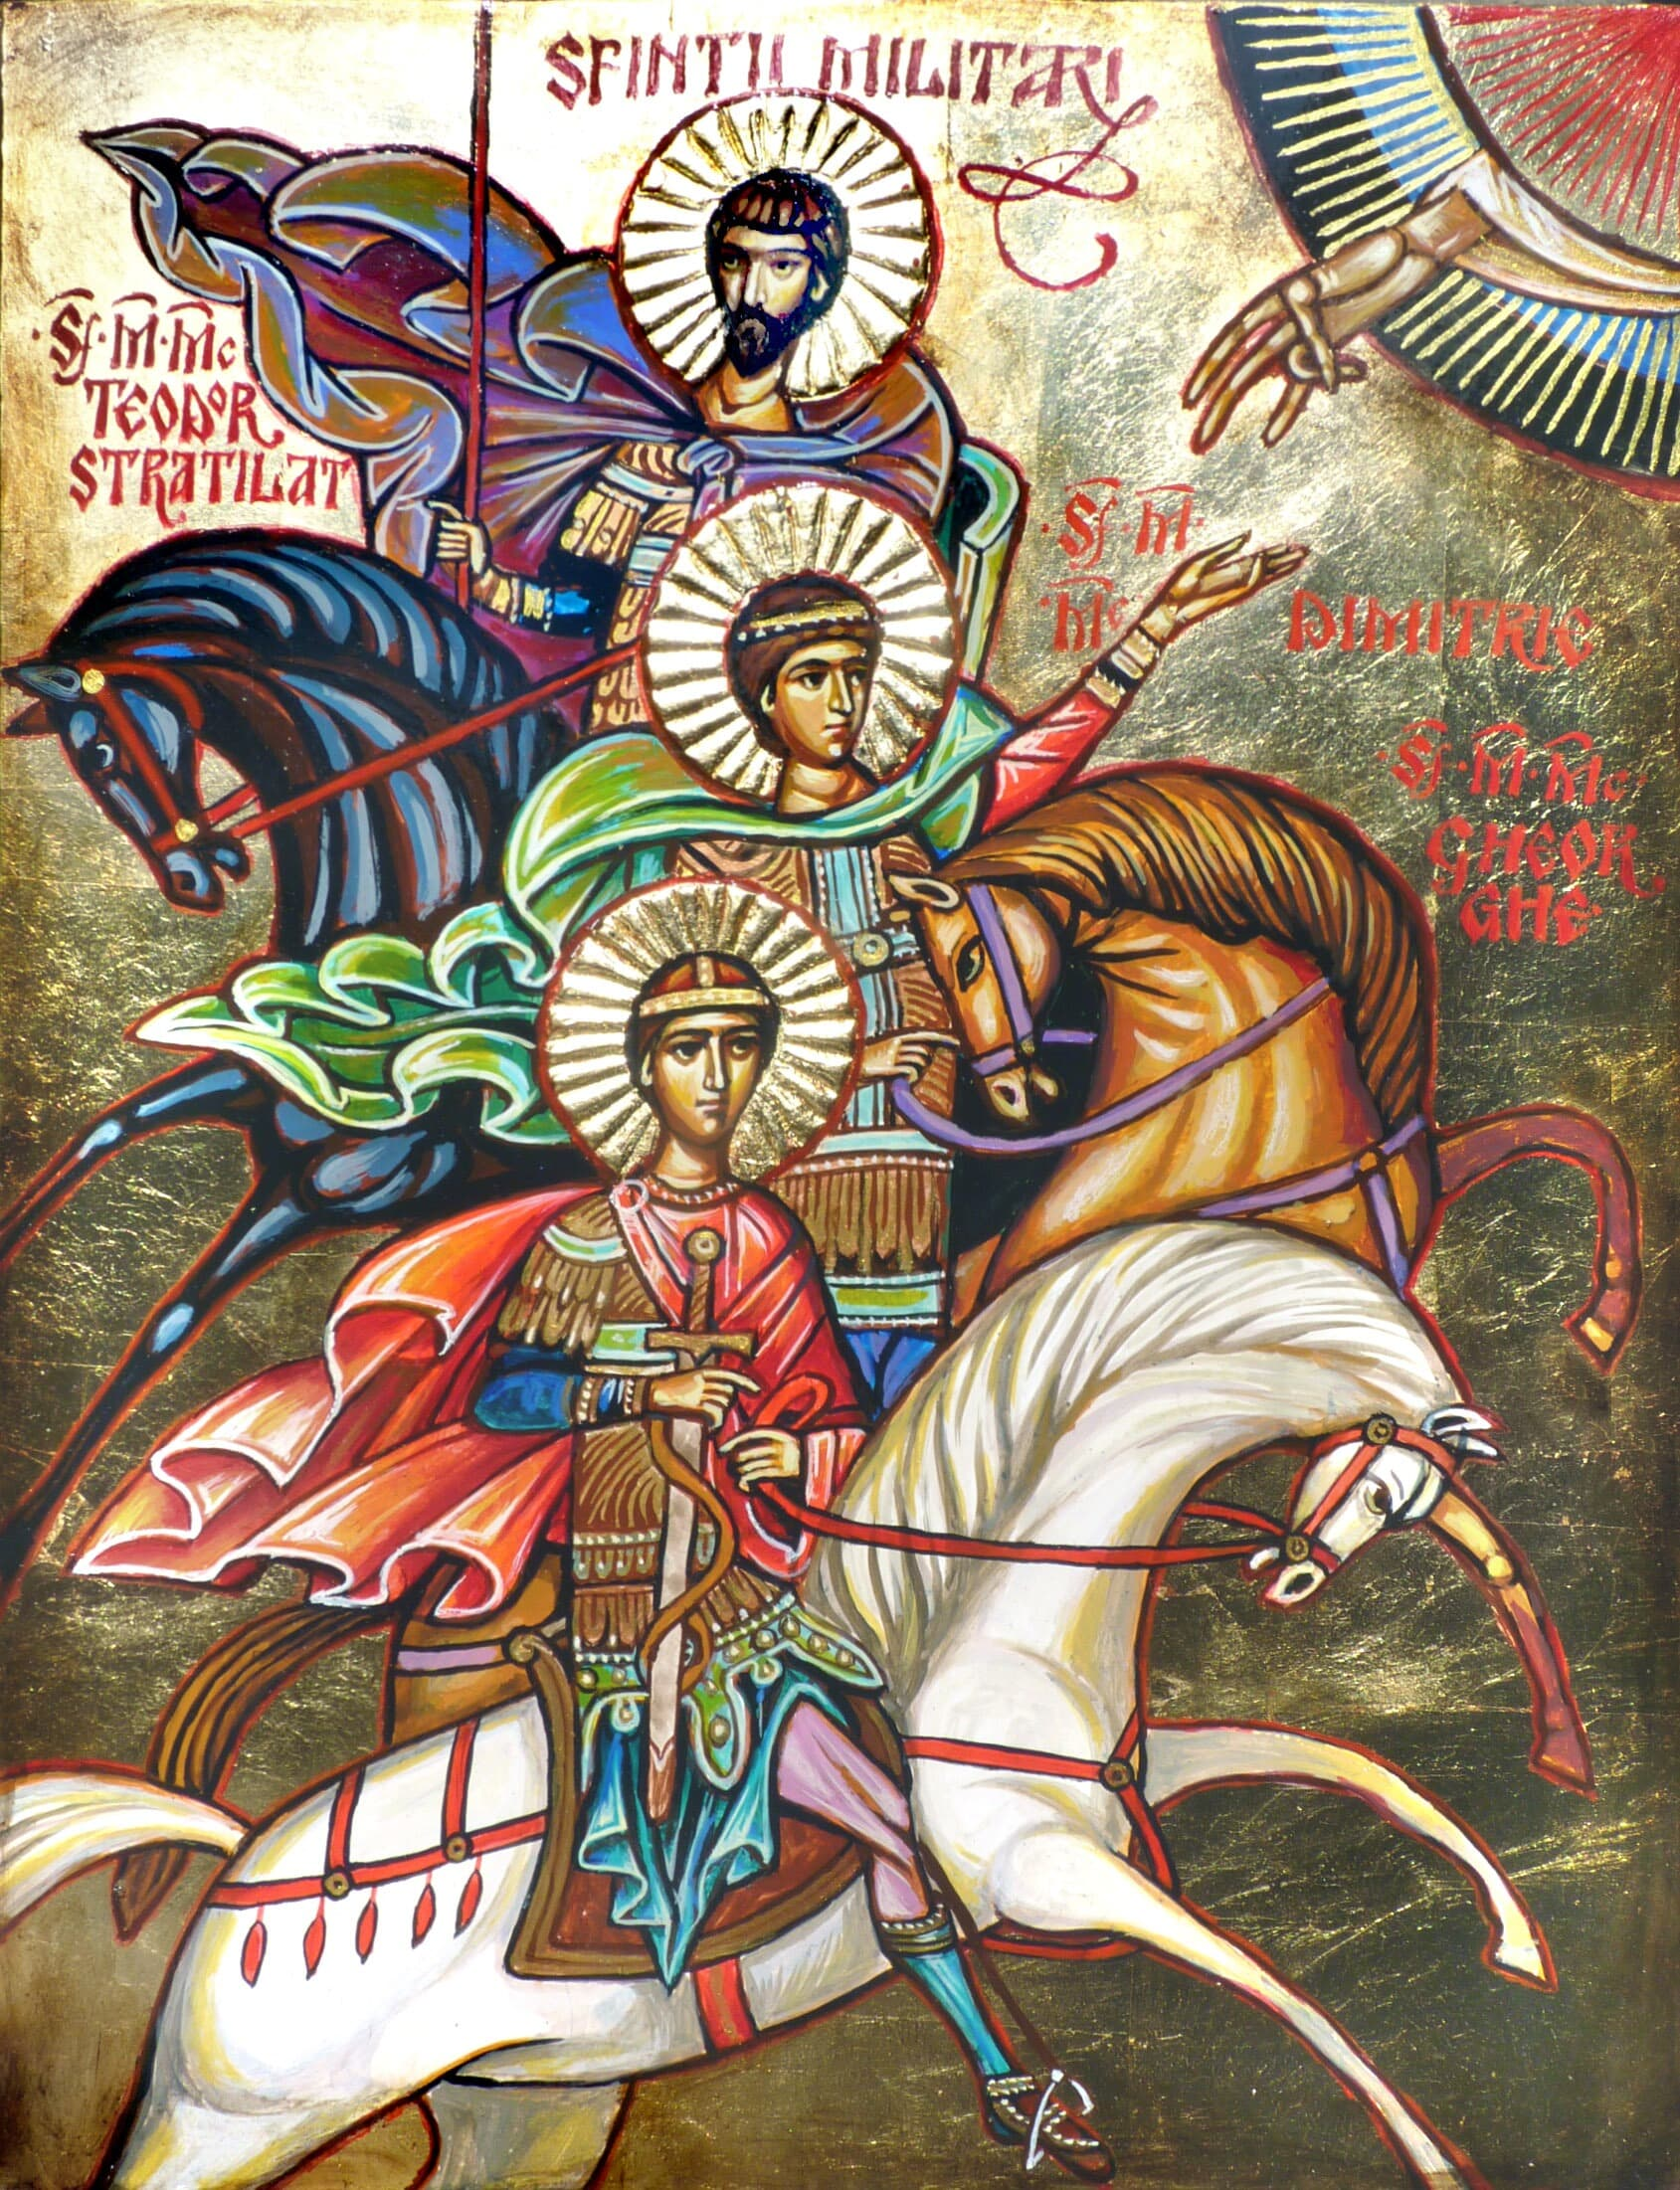 Sfinții Militari (Sf.Teodor Stratilat, Sf. Dimitrie si Sf. Gheorghe) Galerie, Icoane